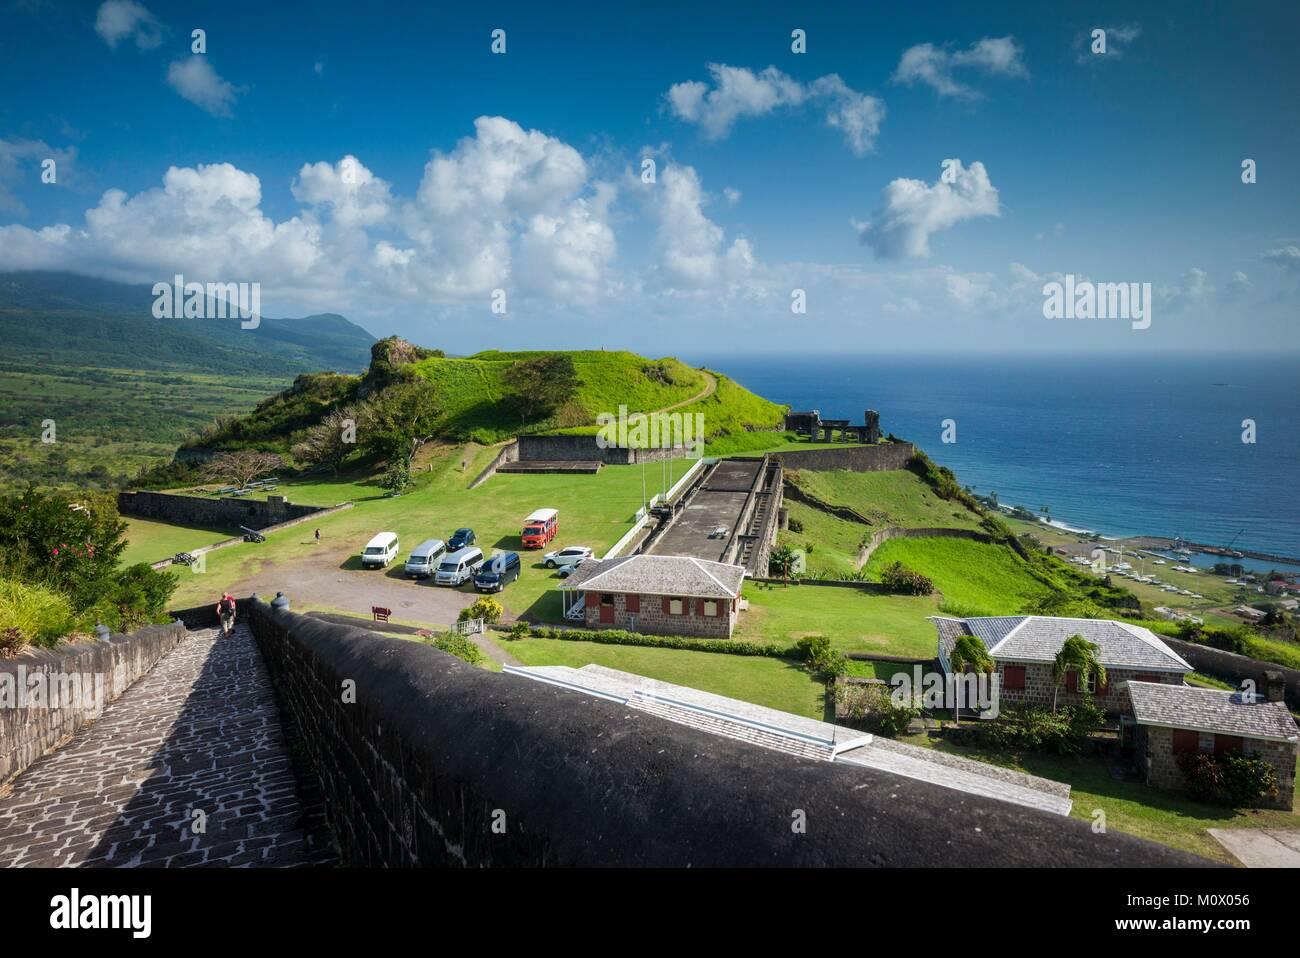 Saint Kitts y Nevis, St. Kitts,Brimstone Hill,Brimstone Hill Fortress Imagen De Stock